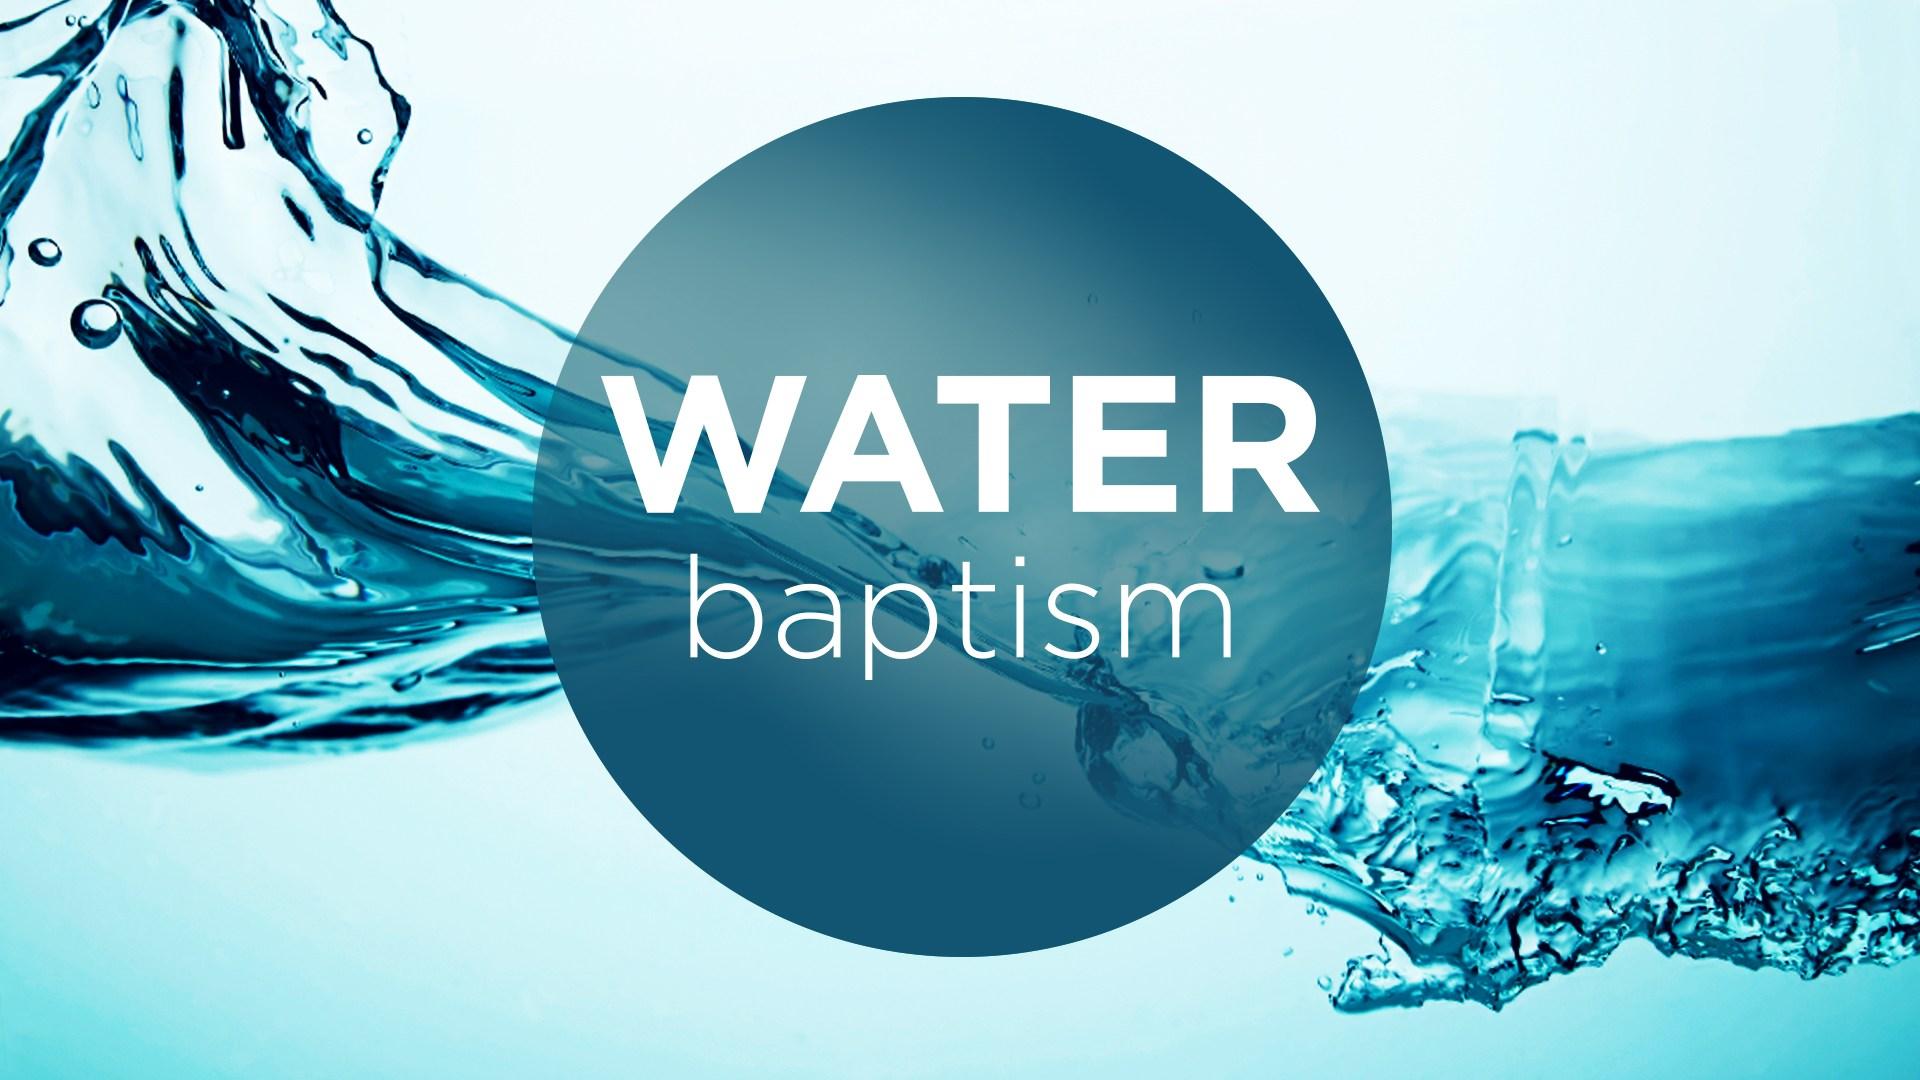 WaterBaptism_A.jpg